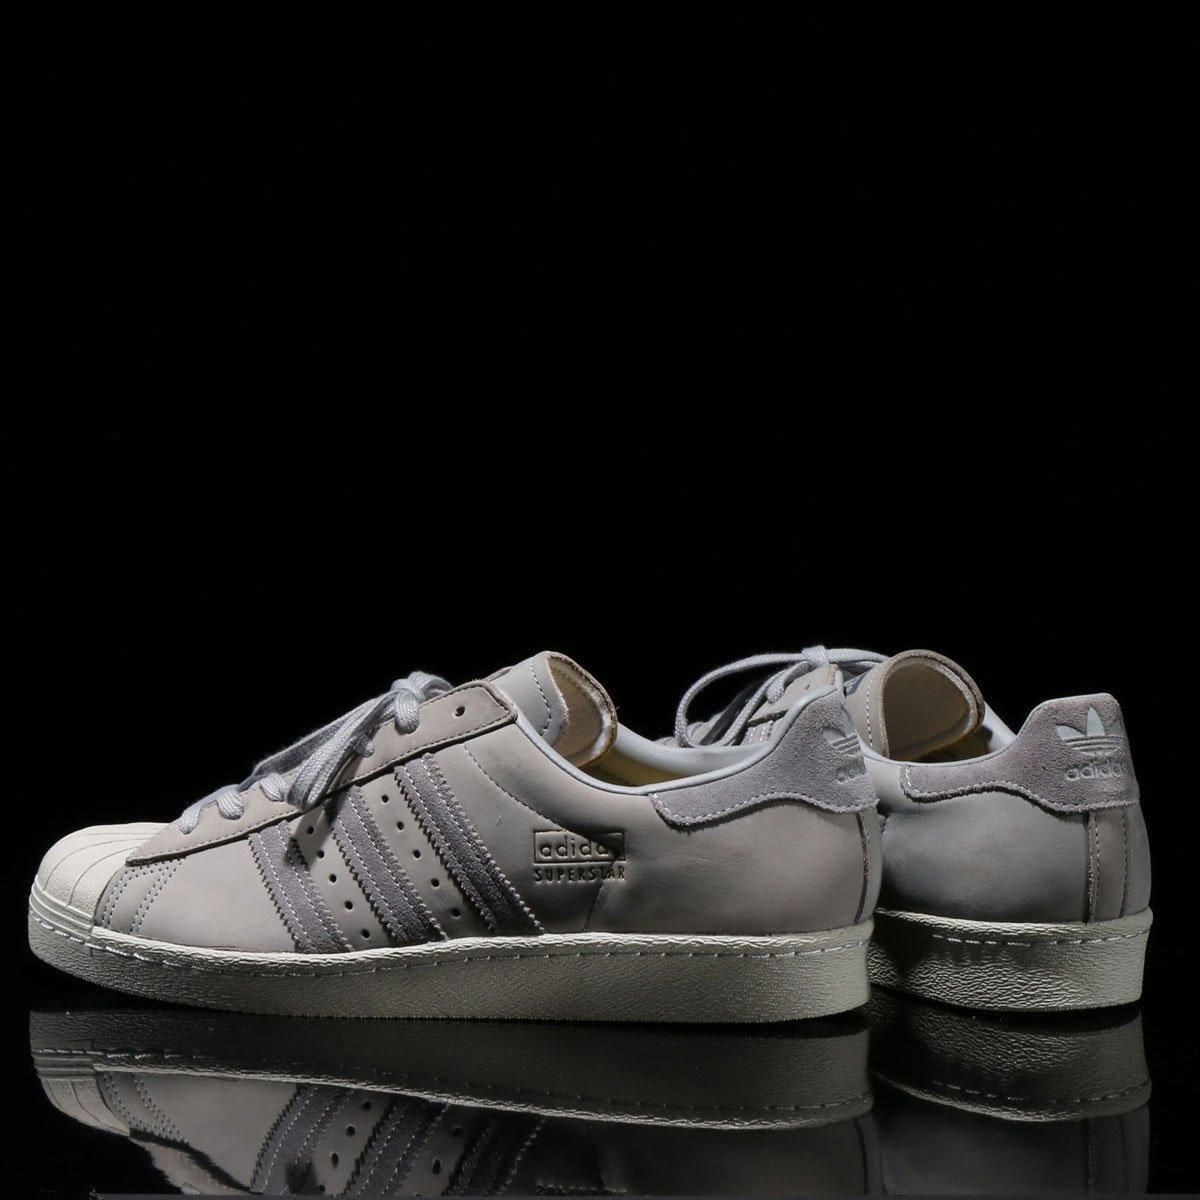 70668fdf9 tenis adidas superstar gris 80s talla   7 original. Cargando zoom.